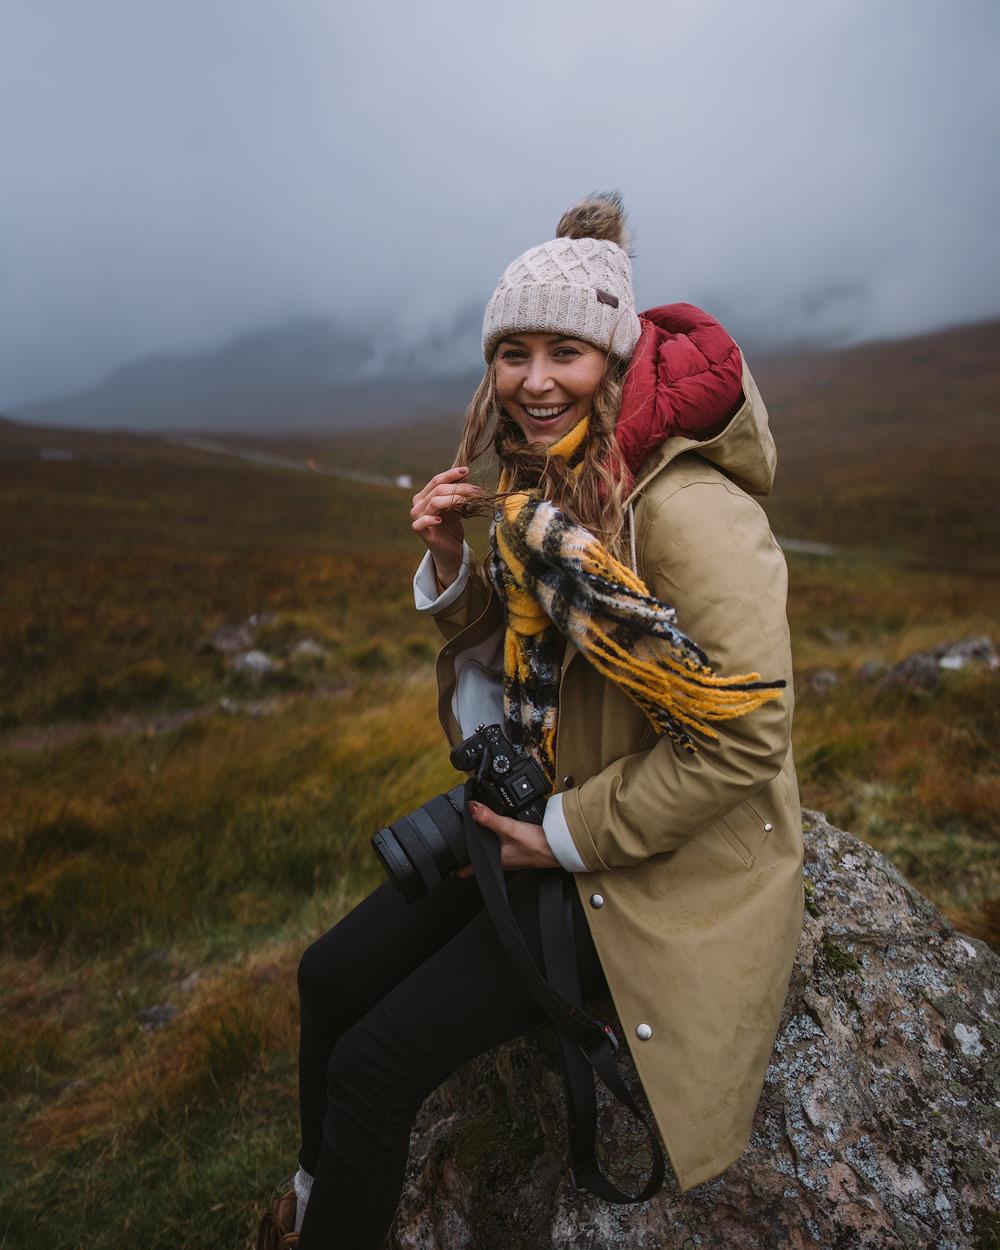 Epic-Isle-of-Skye-Photography-Locations-Renee-Roaming--Scotland-Sony-A7RIII